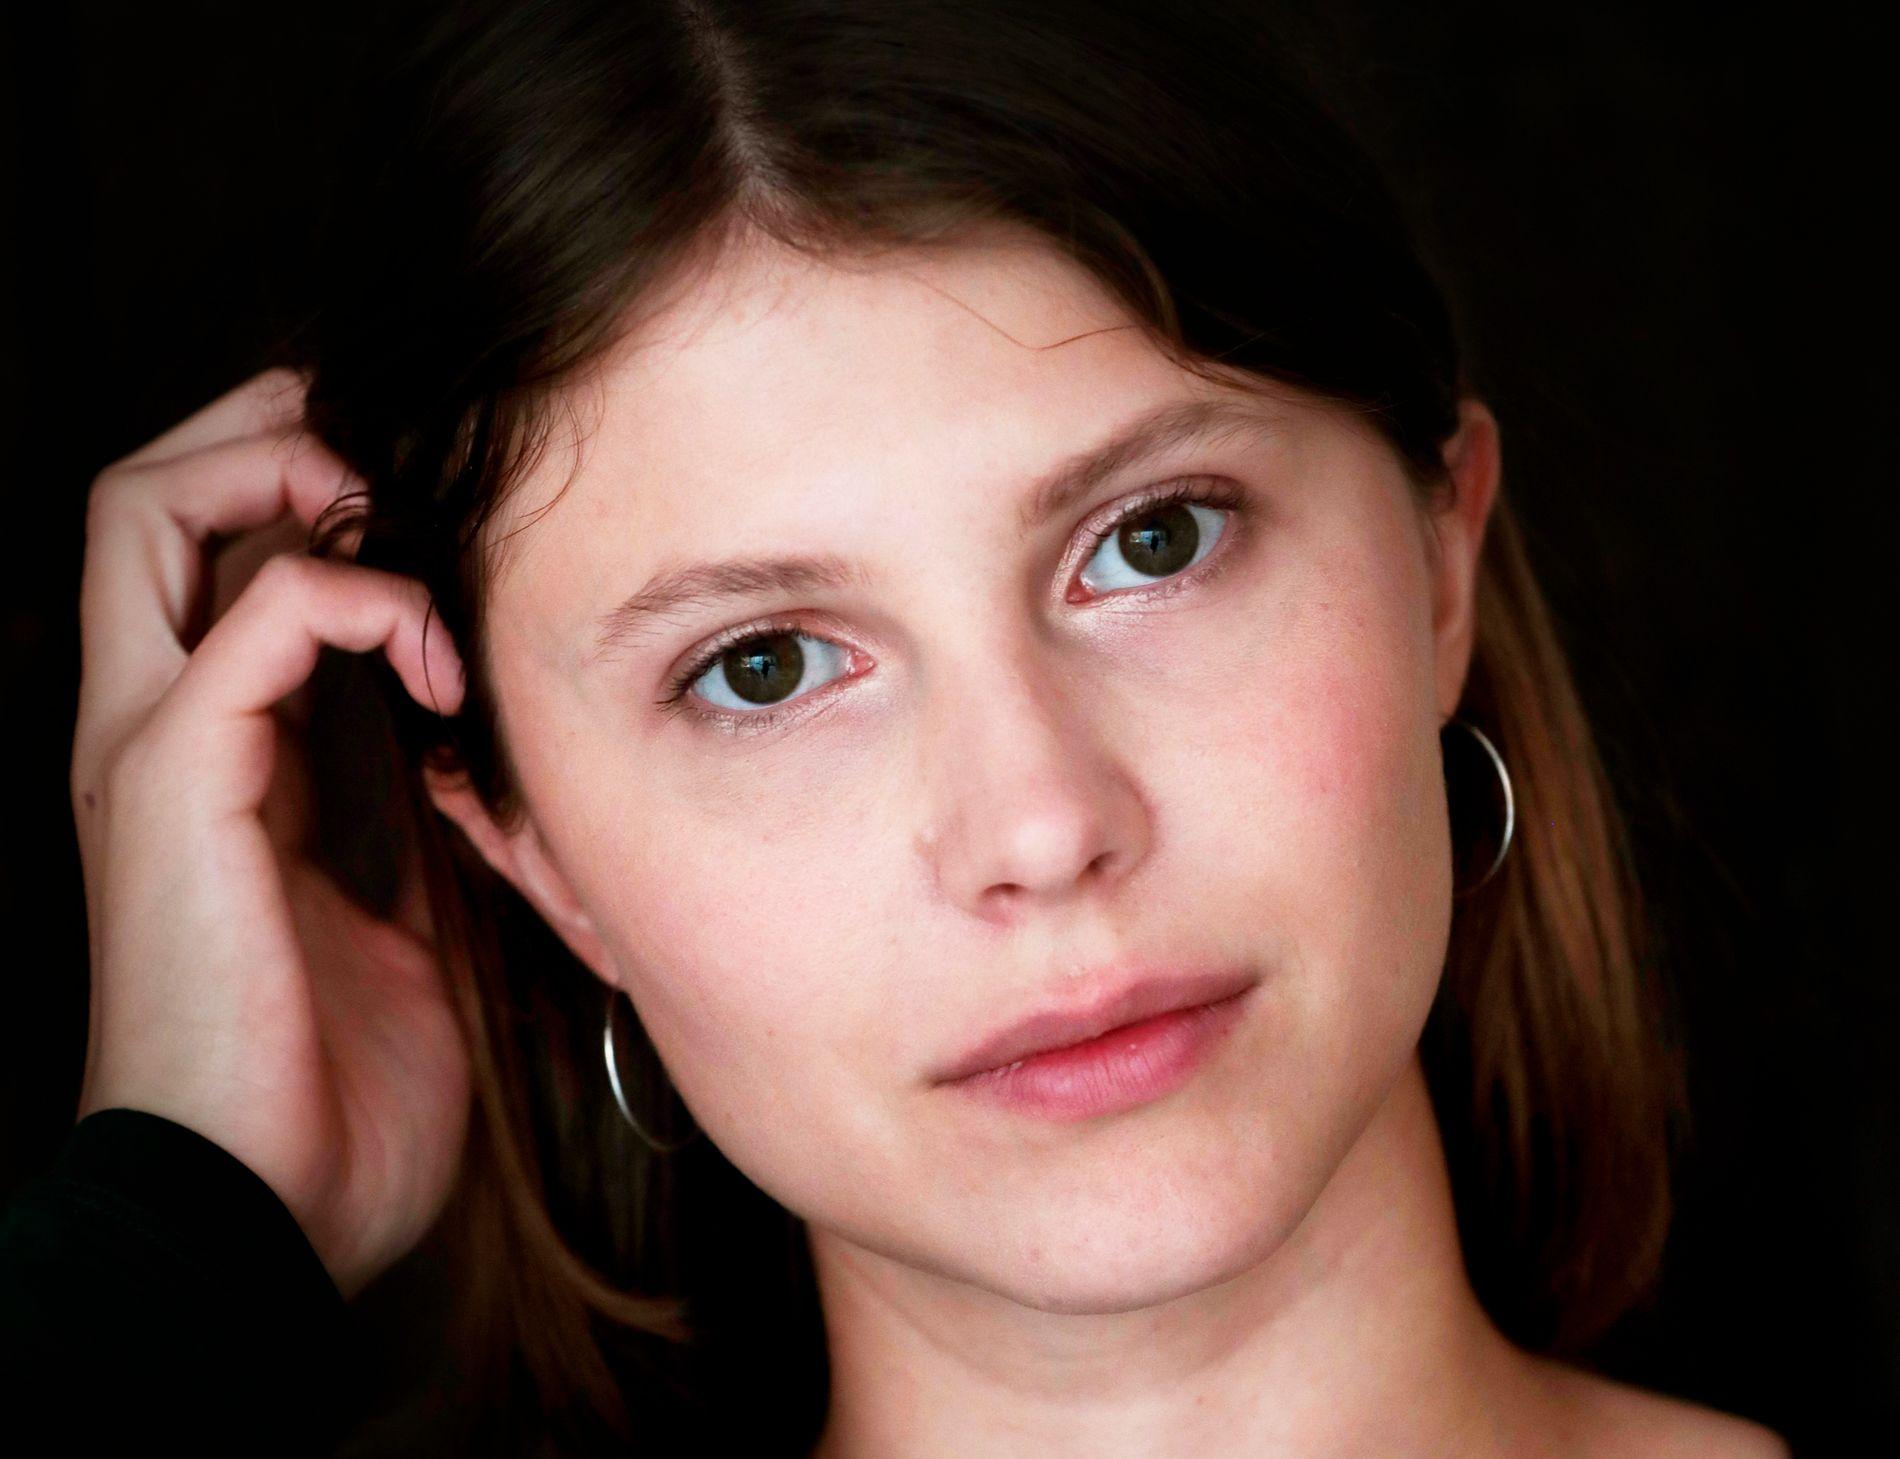 HOVEDROLLEN: Eili Harboe spiller tittelrollen i «Thelma».